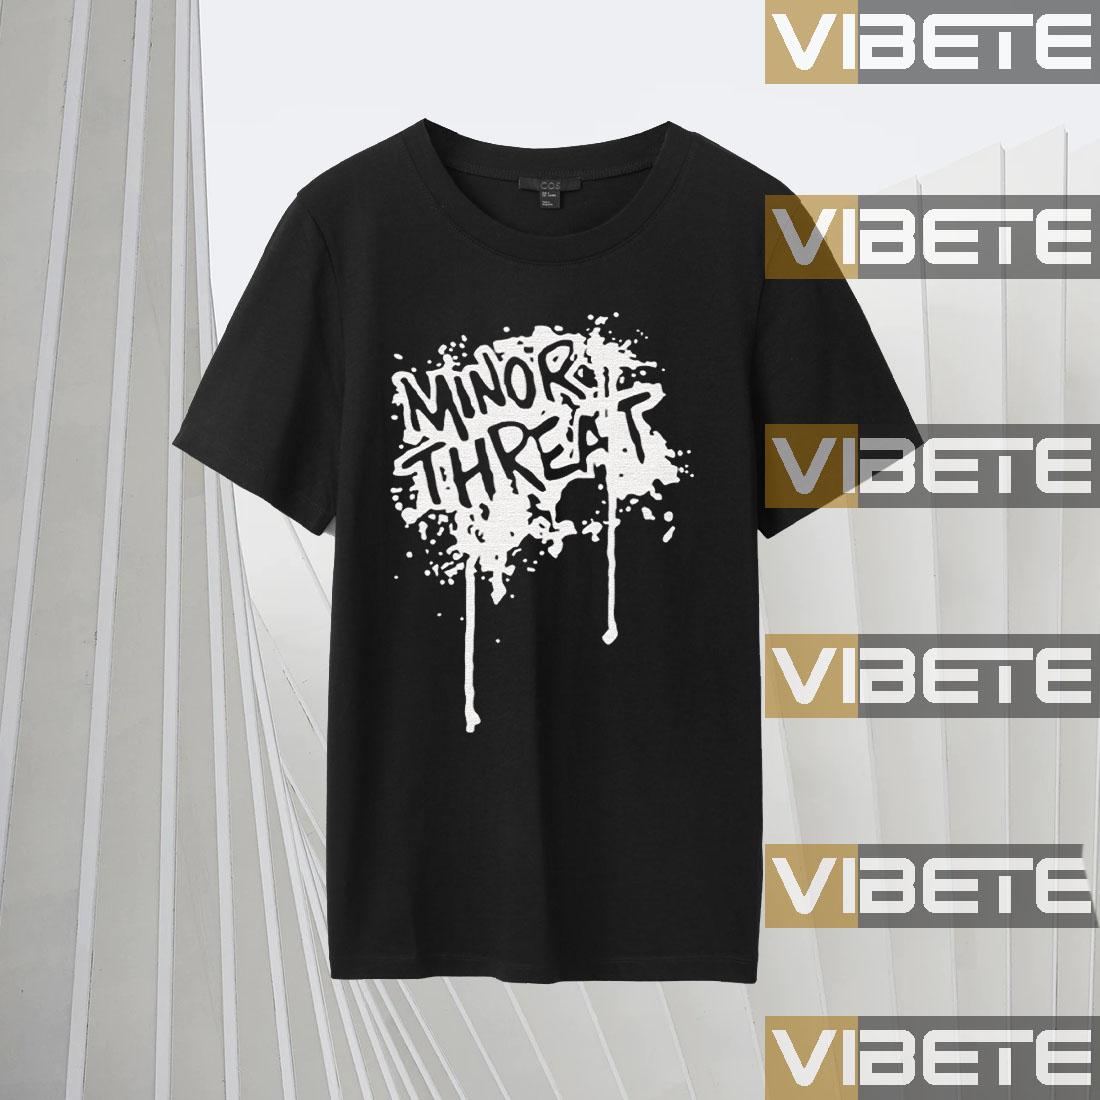 Minor Threat Shirts